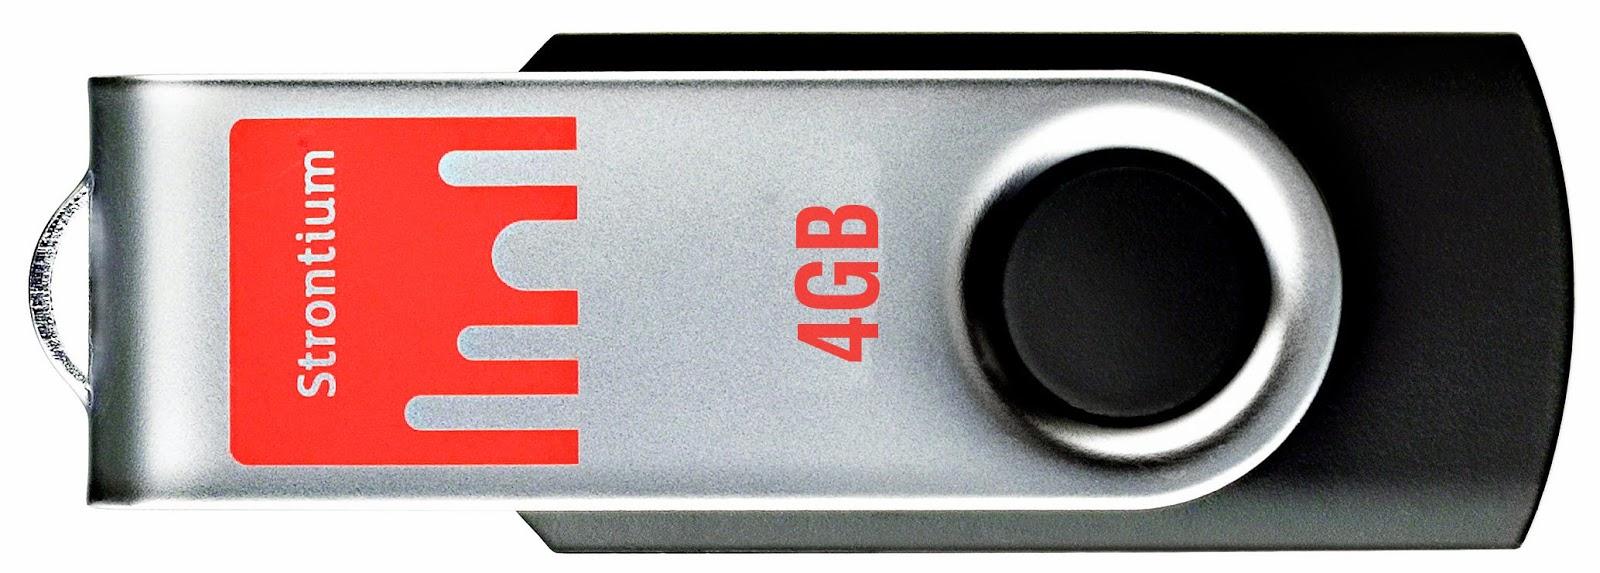 Strontium USB Stick BOLD 4GB format tool